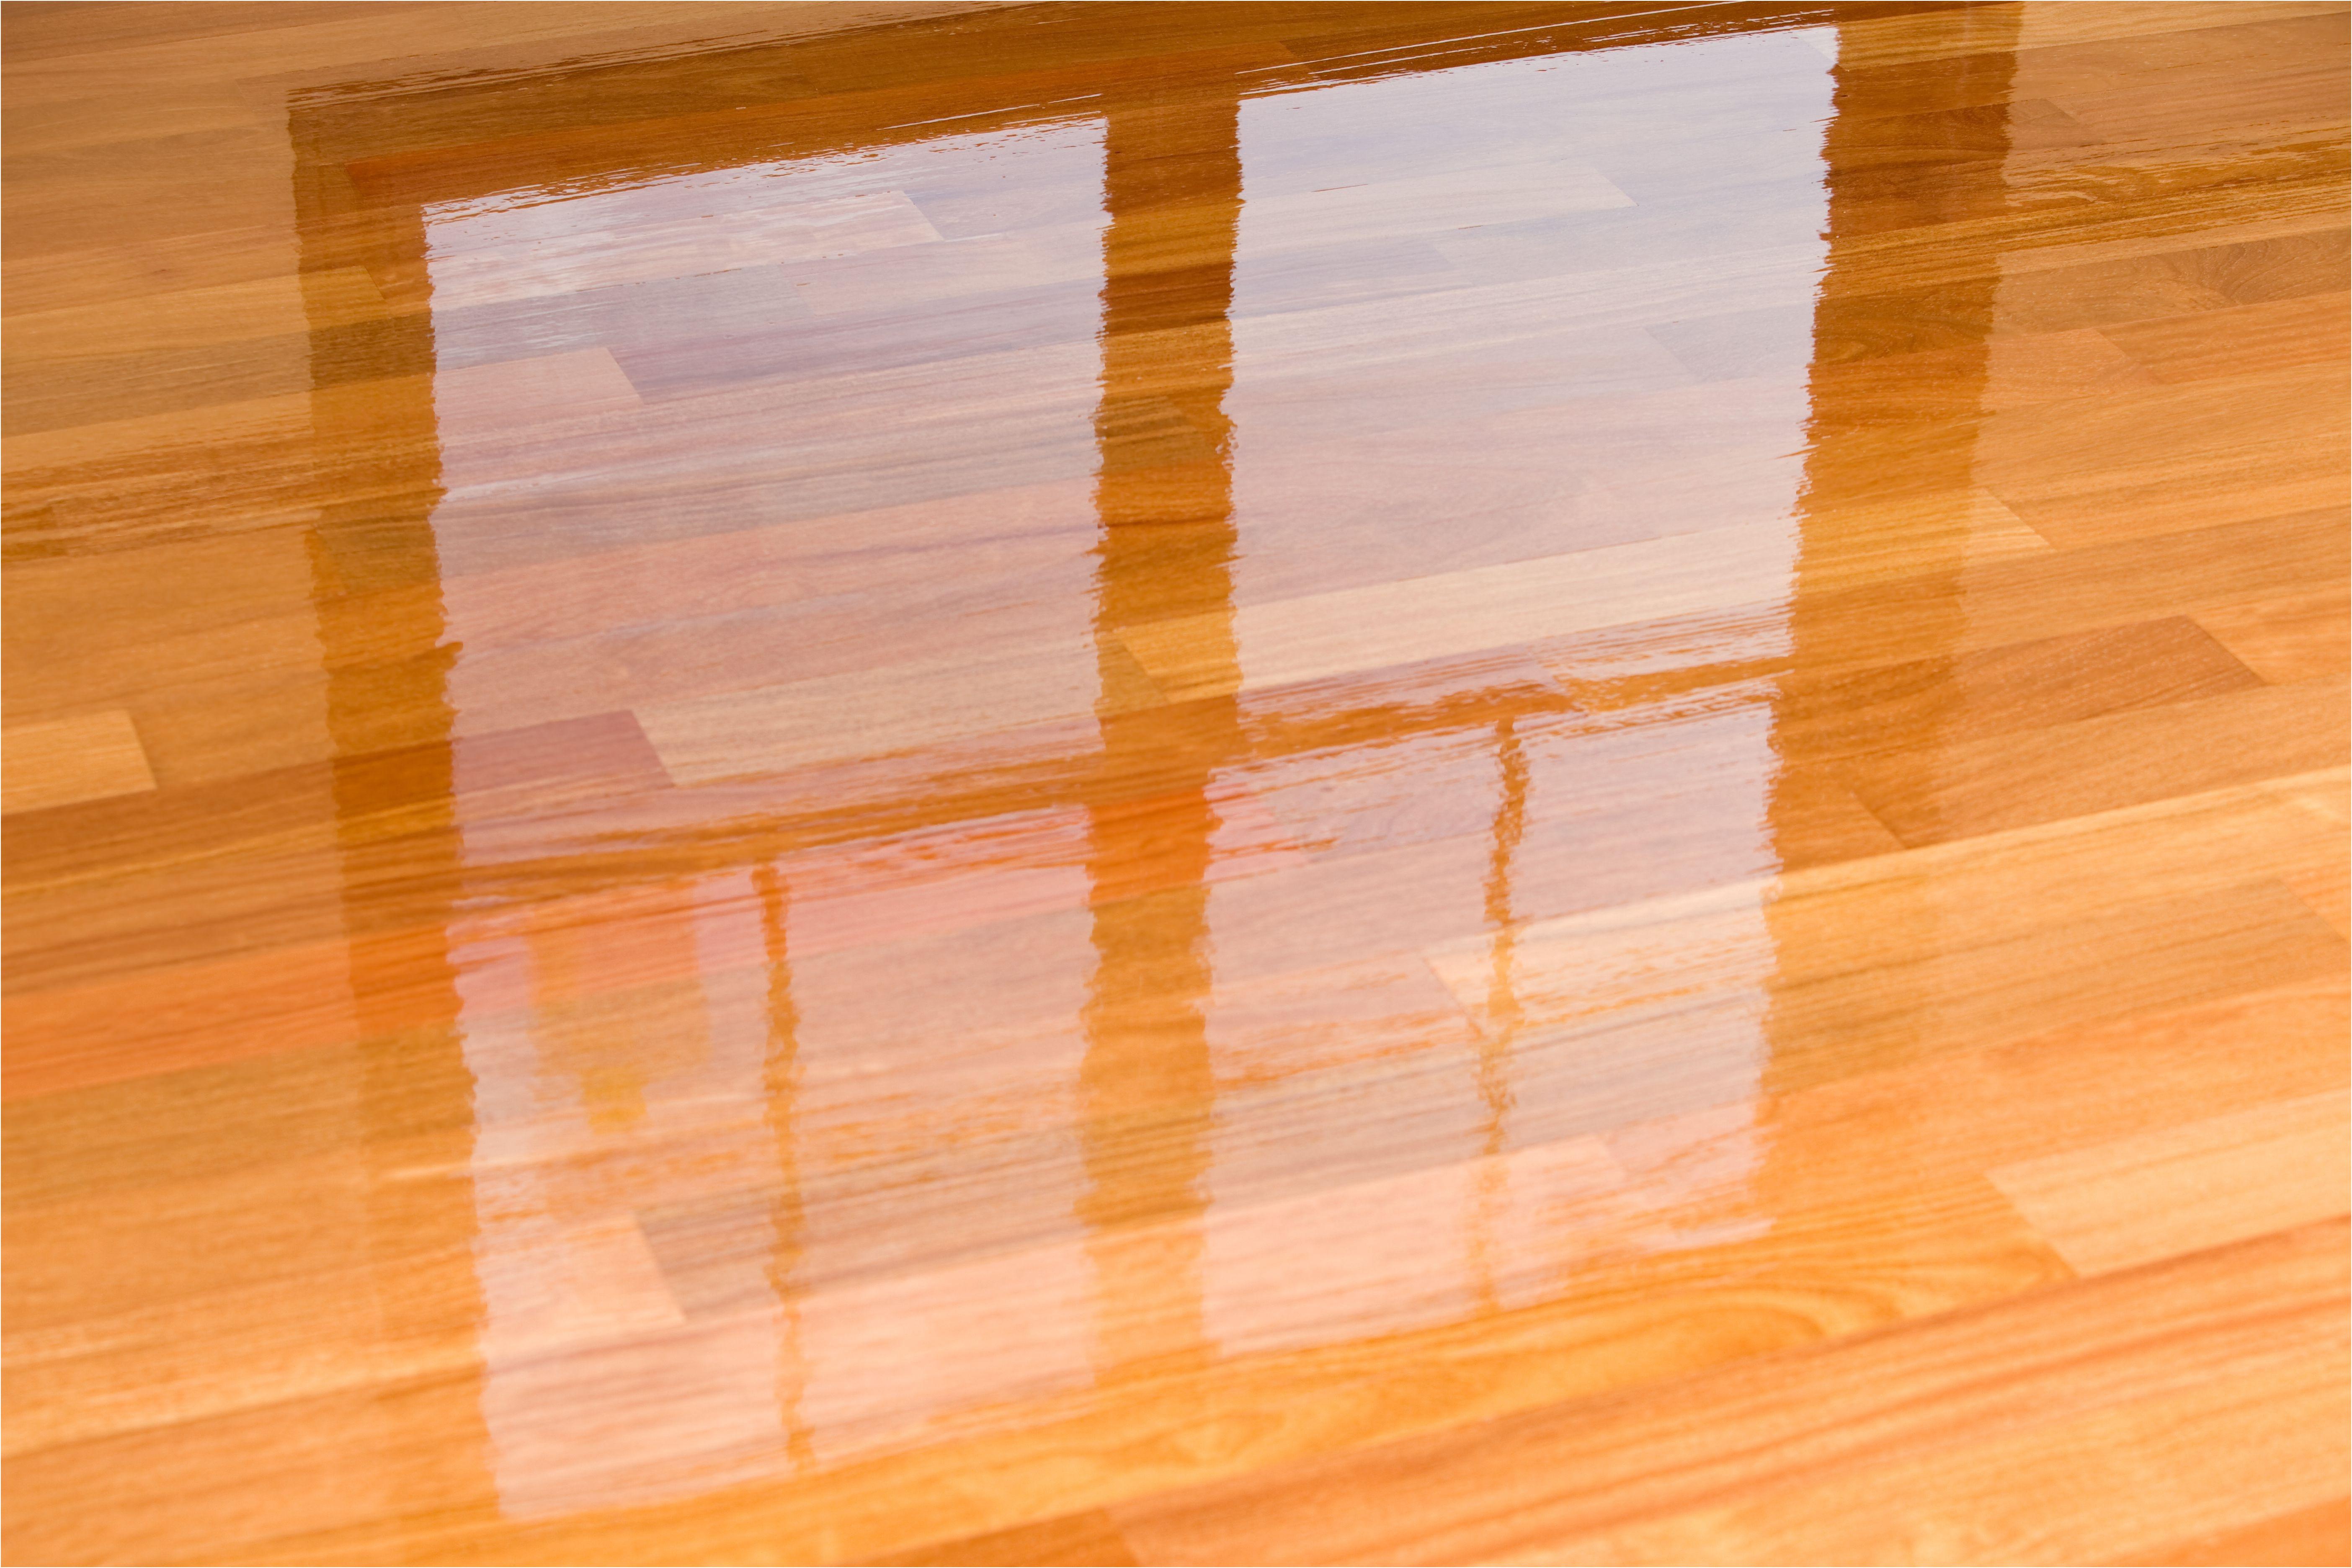 hardwood flooring retailers of hardwood flooring stores near me flooring design with hardwood flooring stores near me inspirational guide to laminate flooring water and damage repair of hardwood